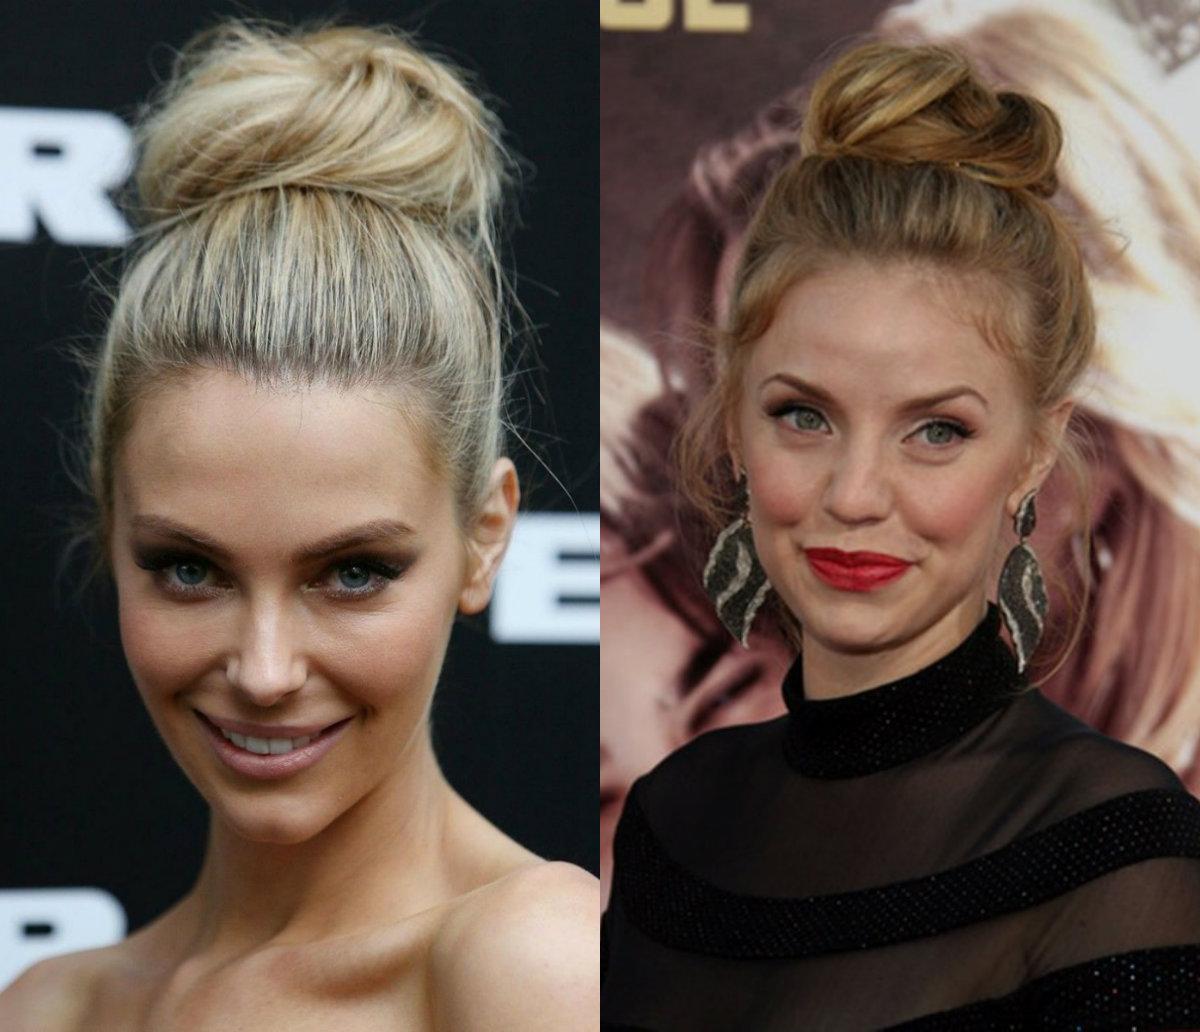 classy-high-bun-party-hairstyles-2017